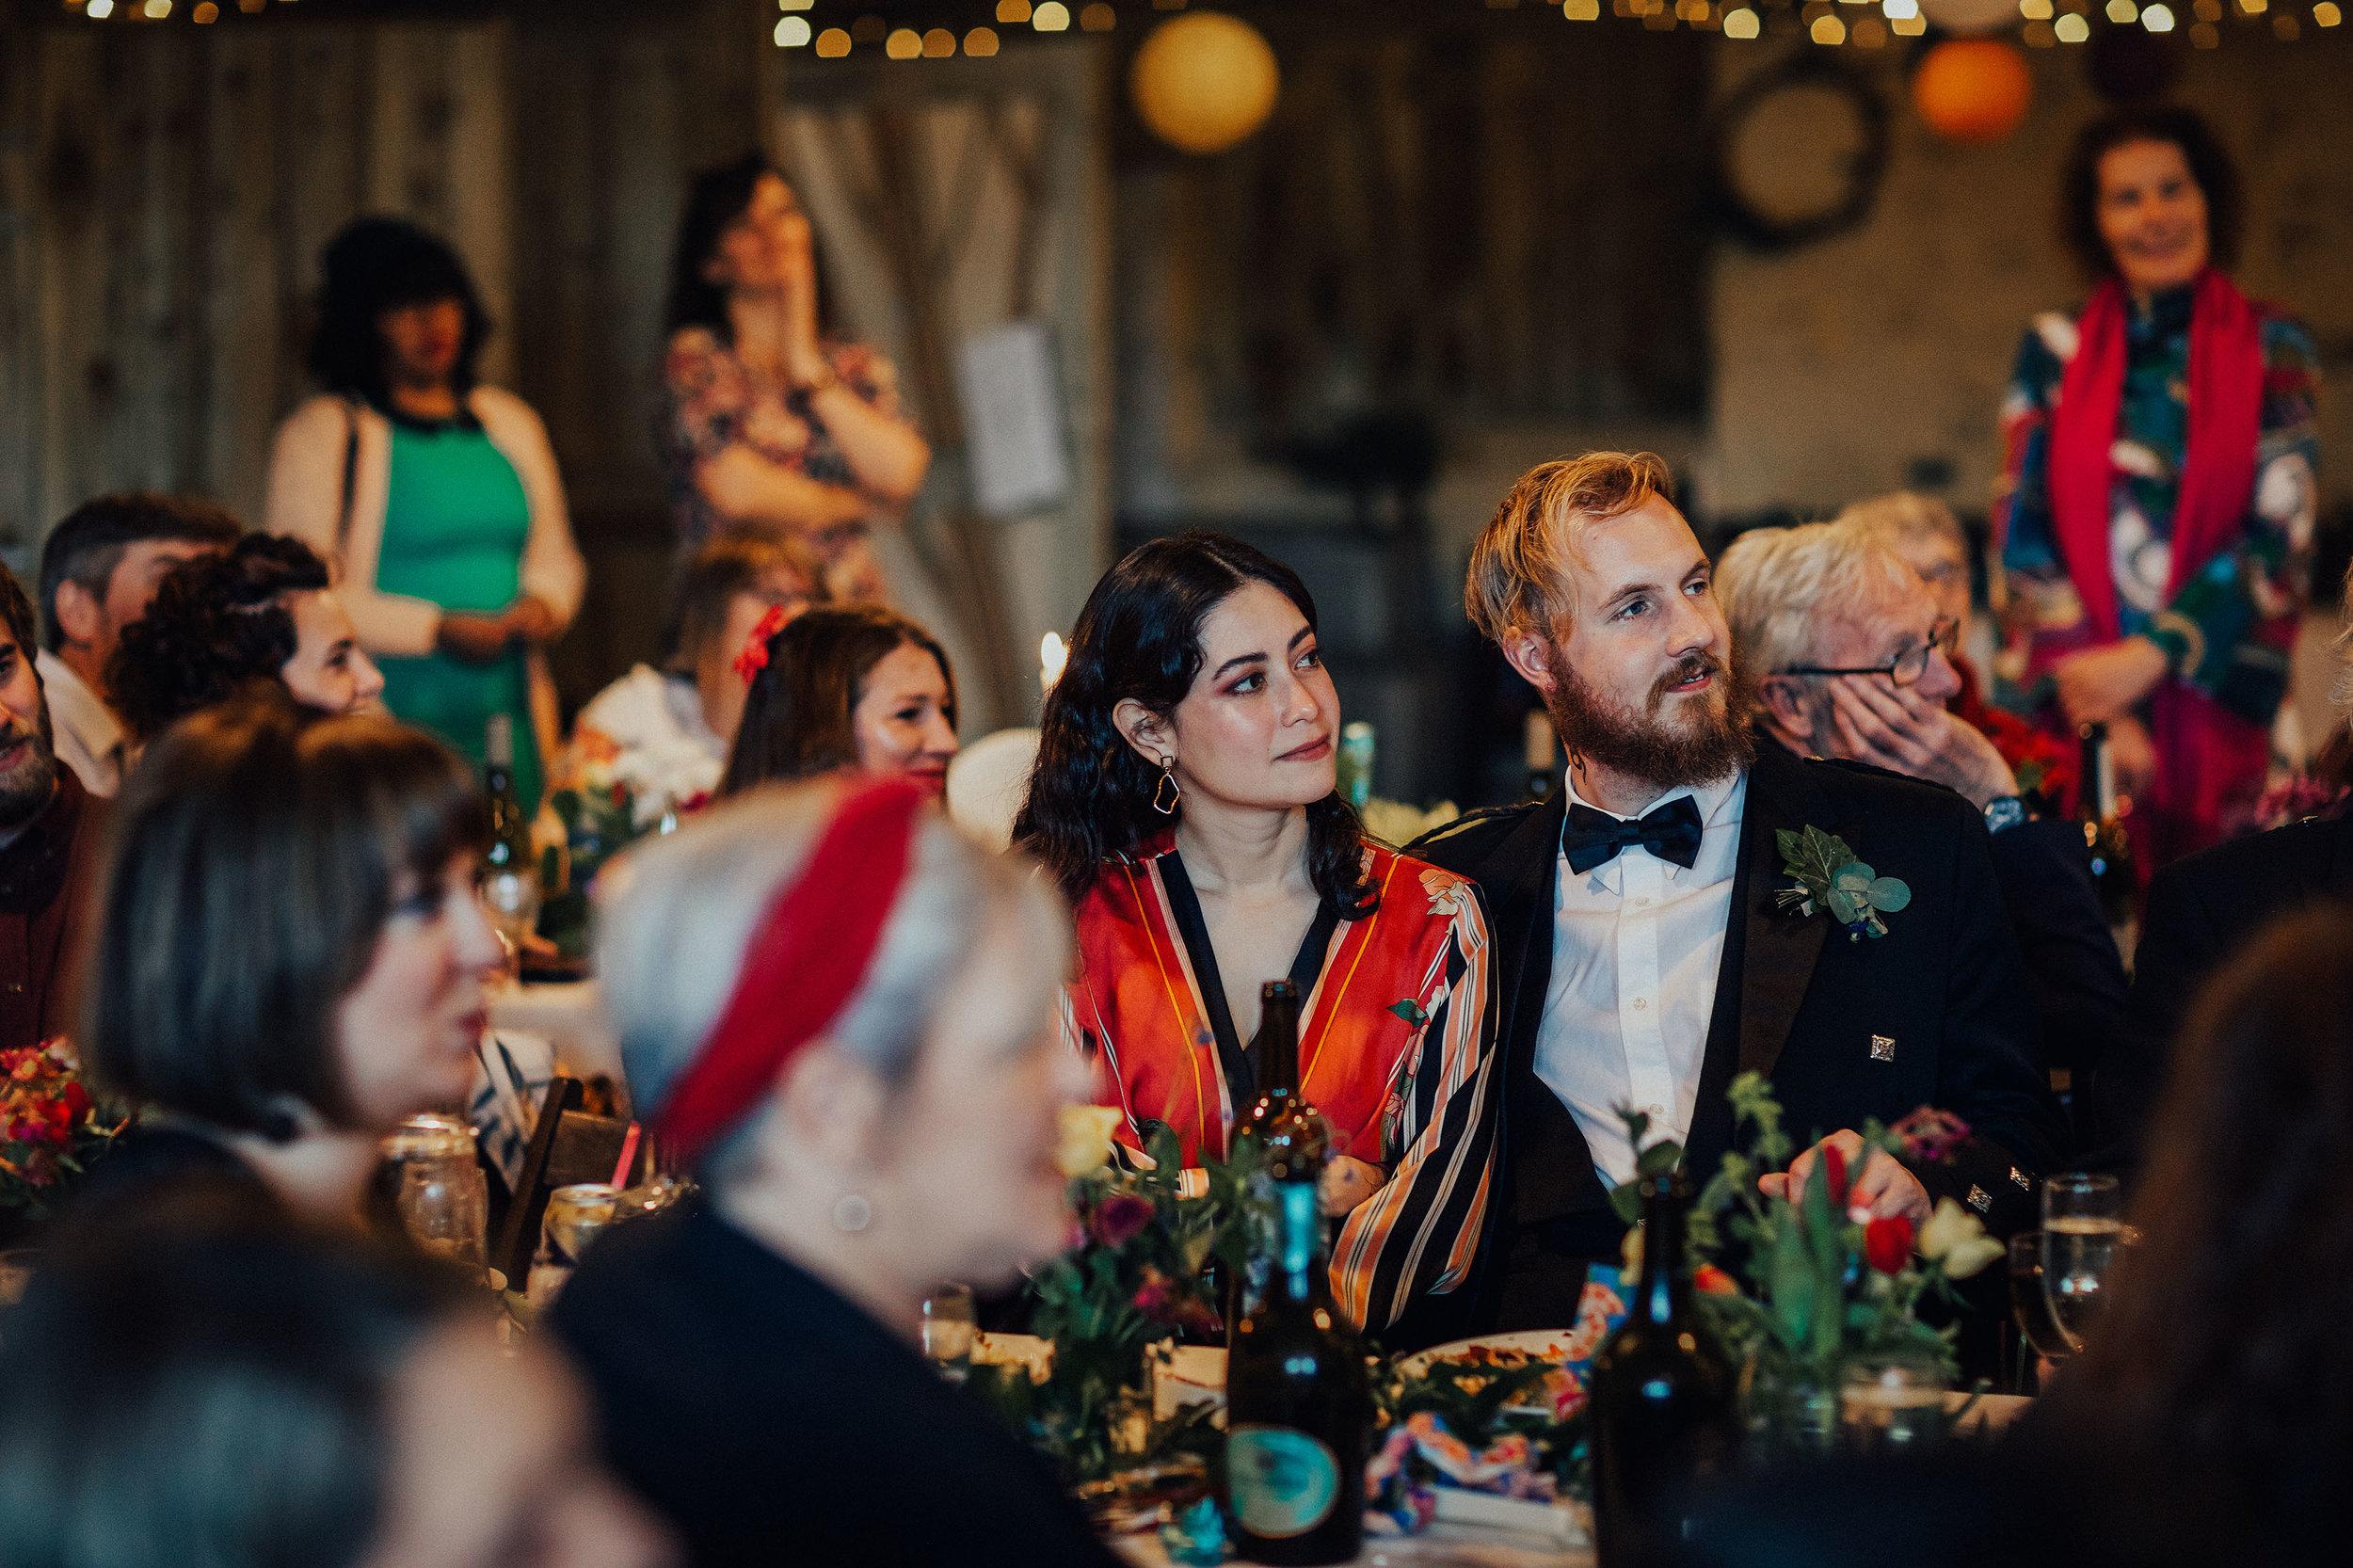 COMRIE_CROFT_WEDDINGS_PJ_PHILLIPS_PHOTOGRAPHY_155.jpg